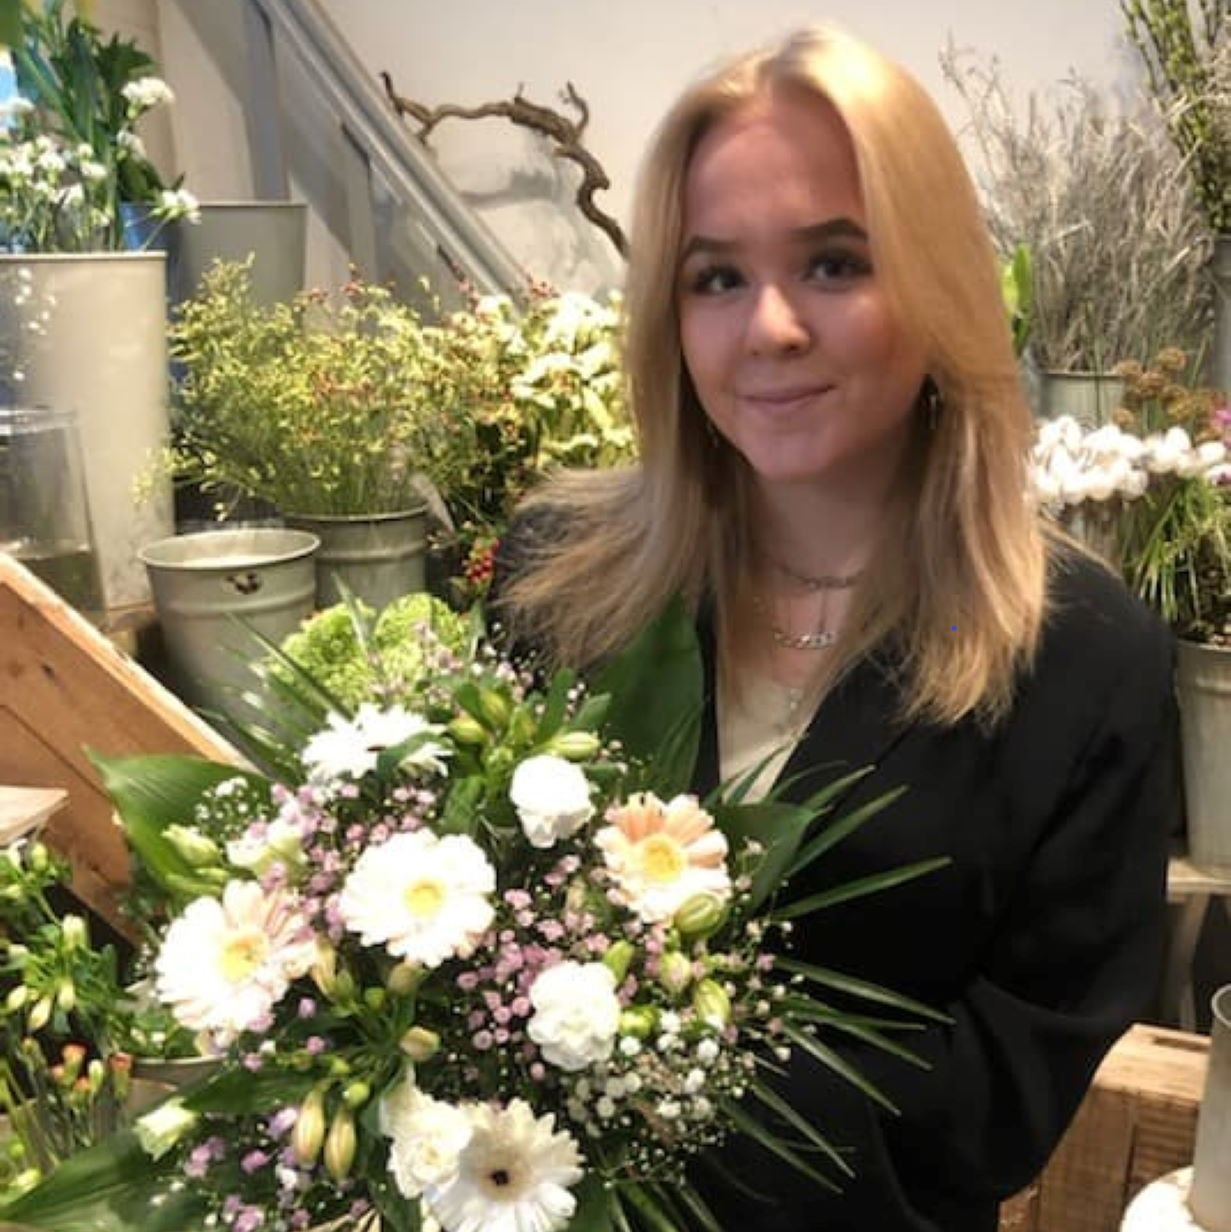 Annika Nikolajsen Aarstidens Blomster